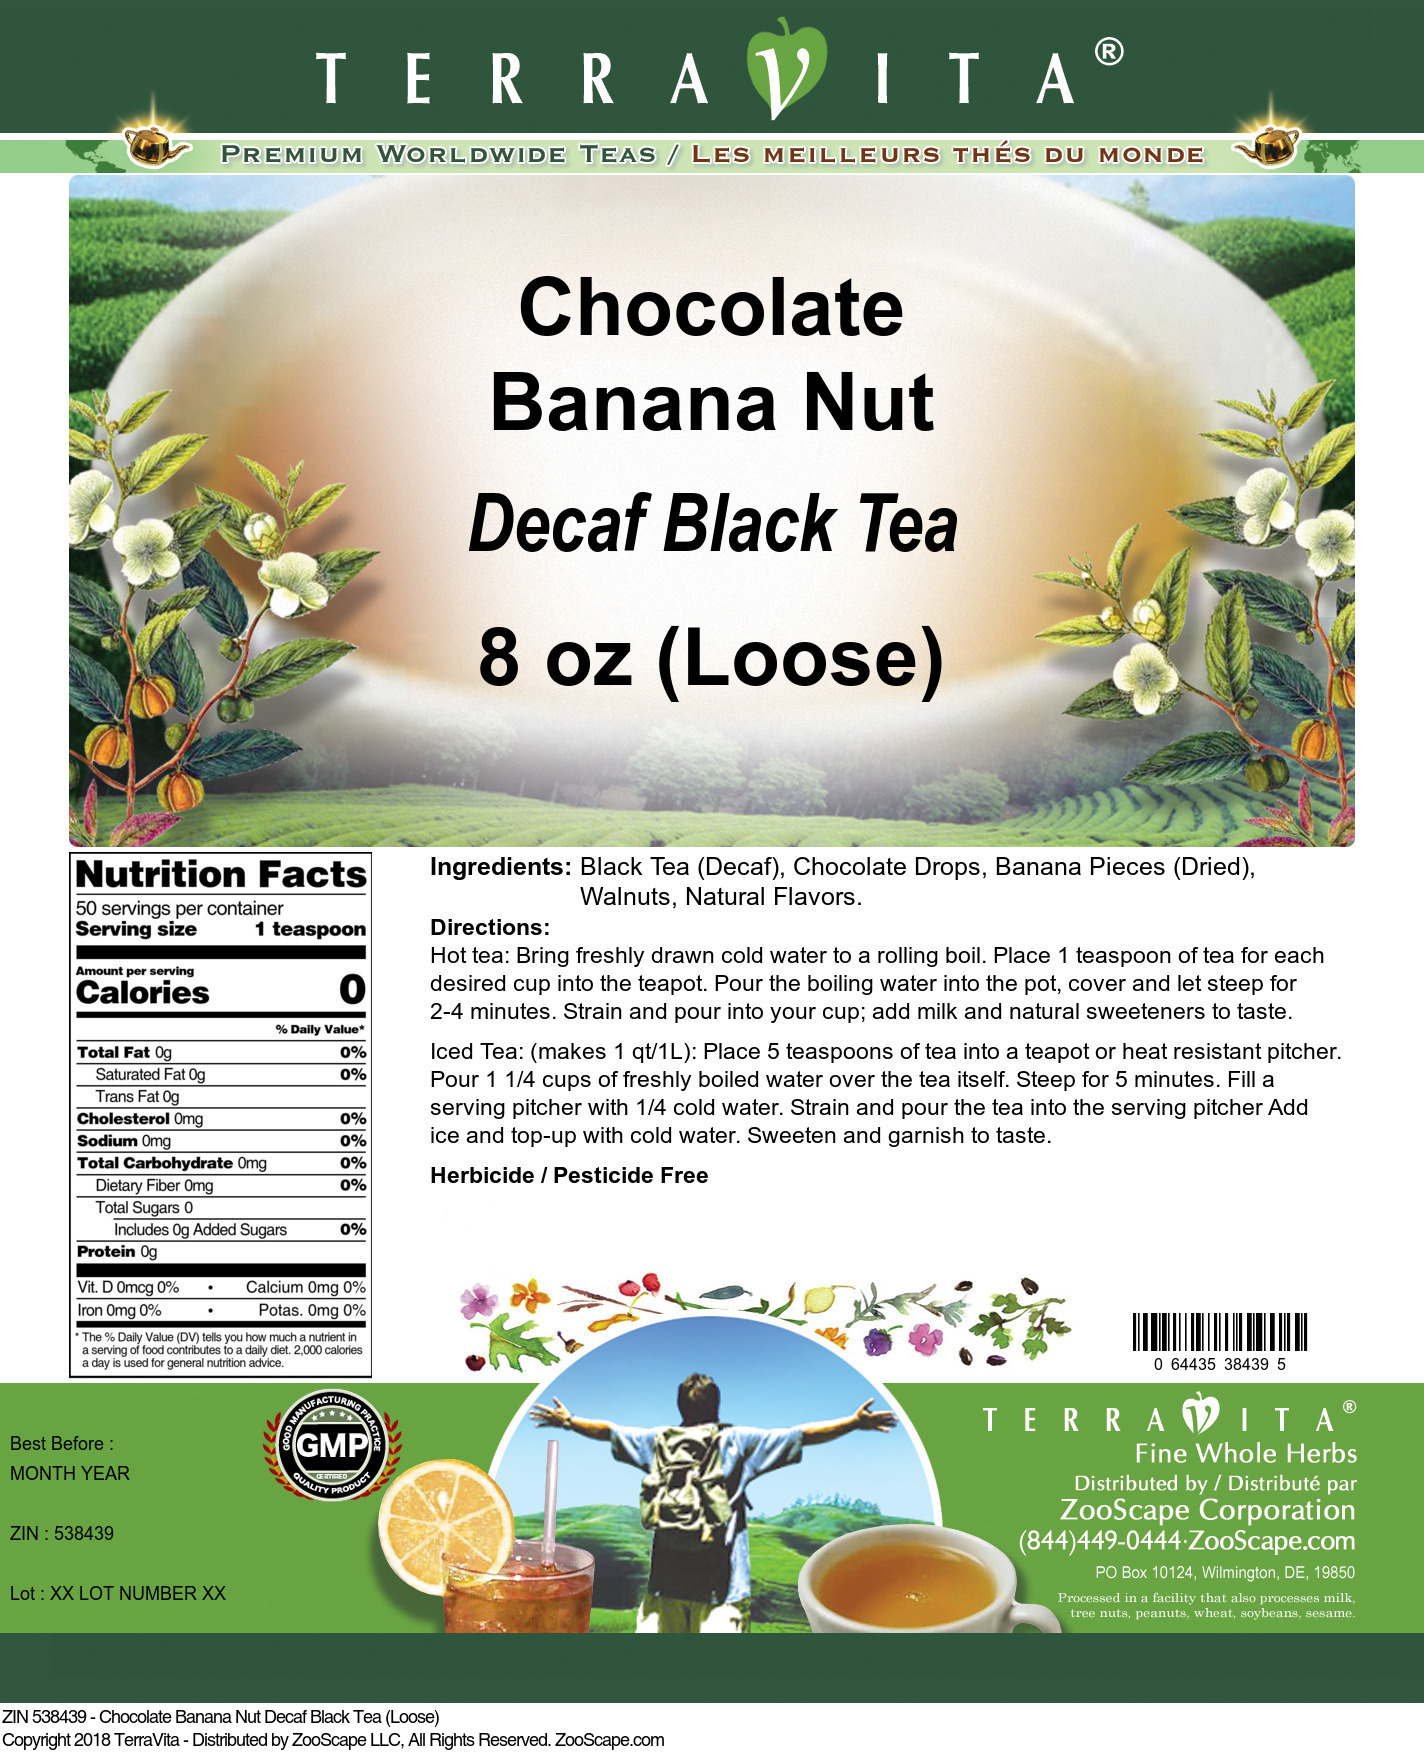 Chocolate Banana Nut Decaf Black Tea (Loose)